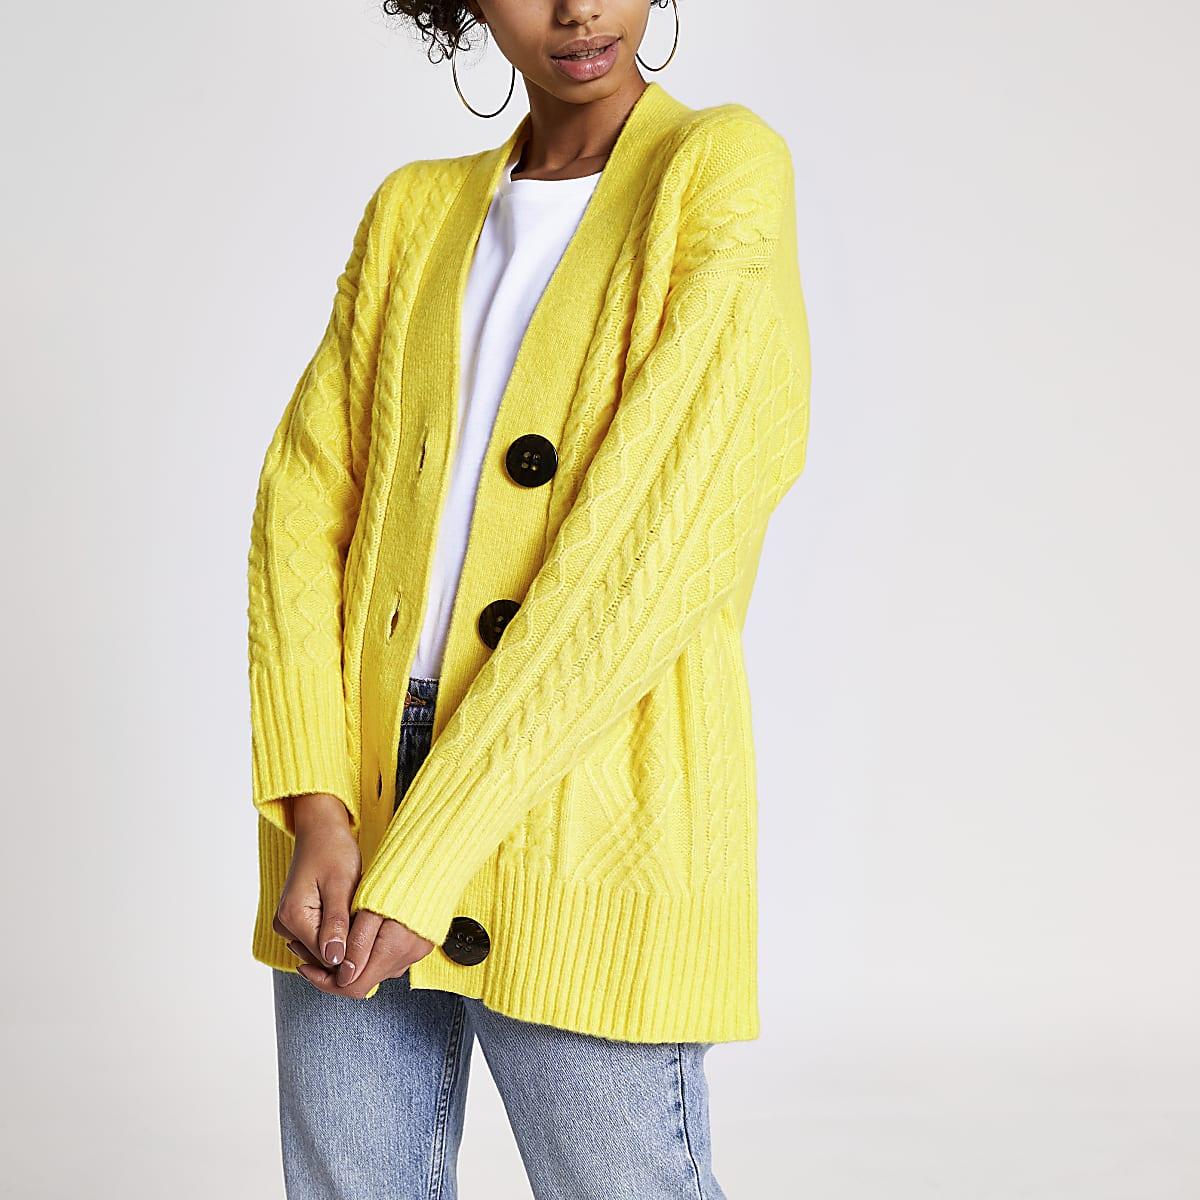 Cardigan oversizeen tricot jaune